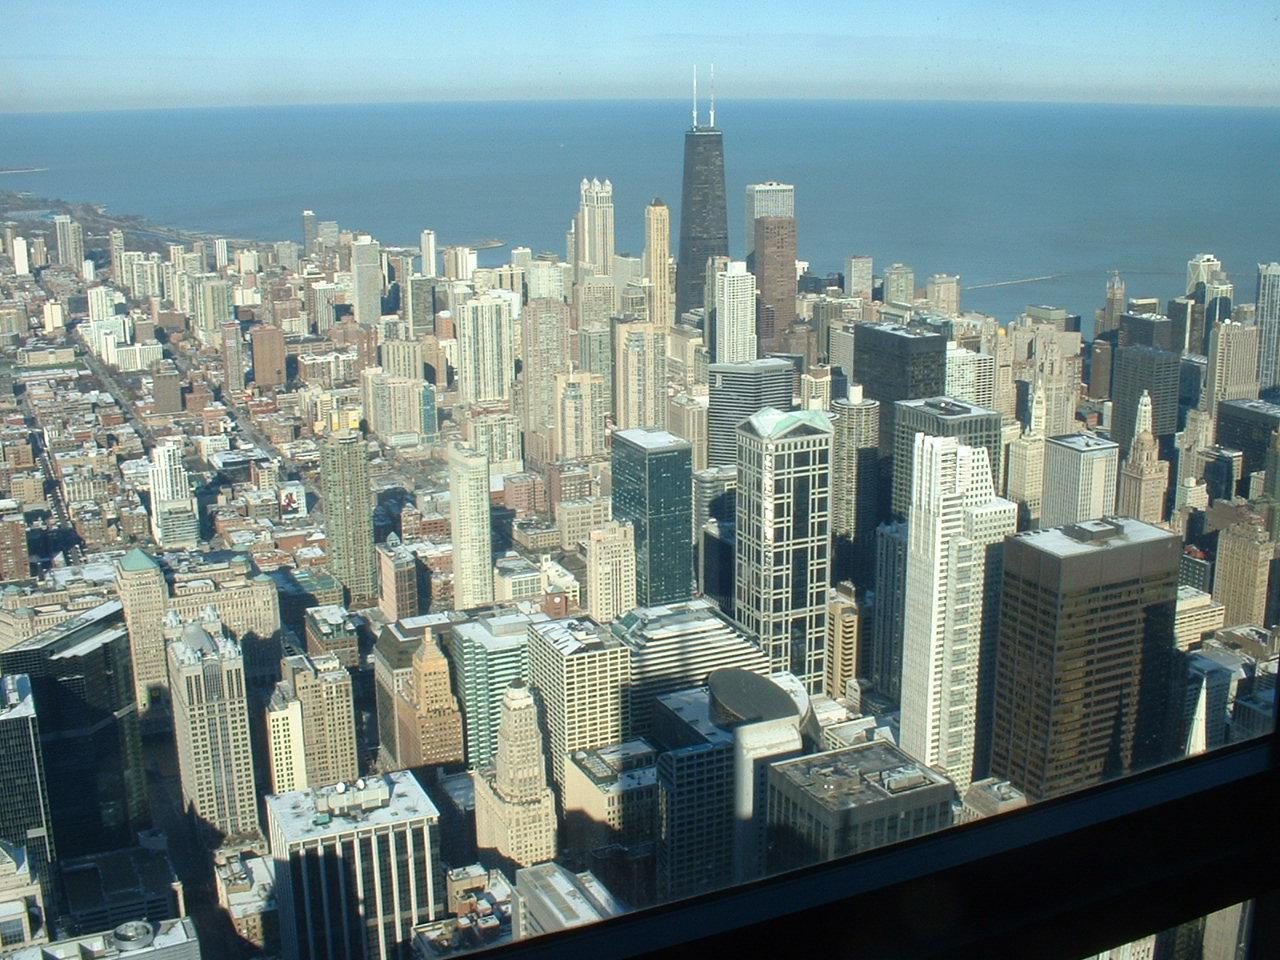 File:City (Urban).jpg - Wikipedia